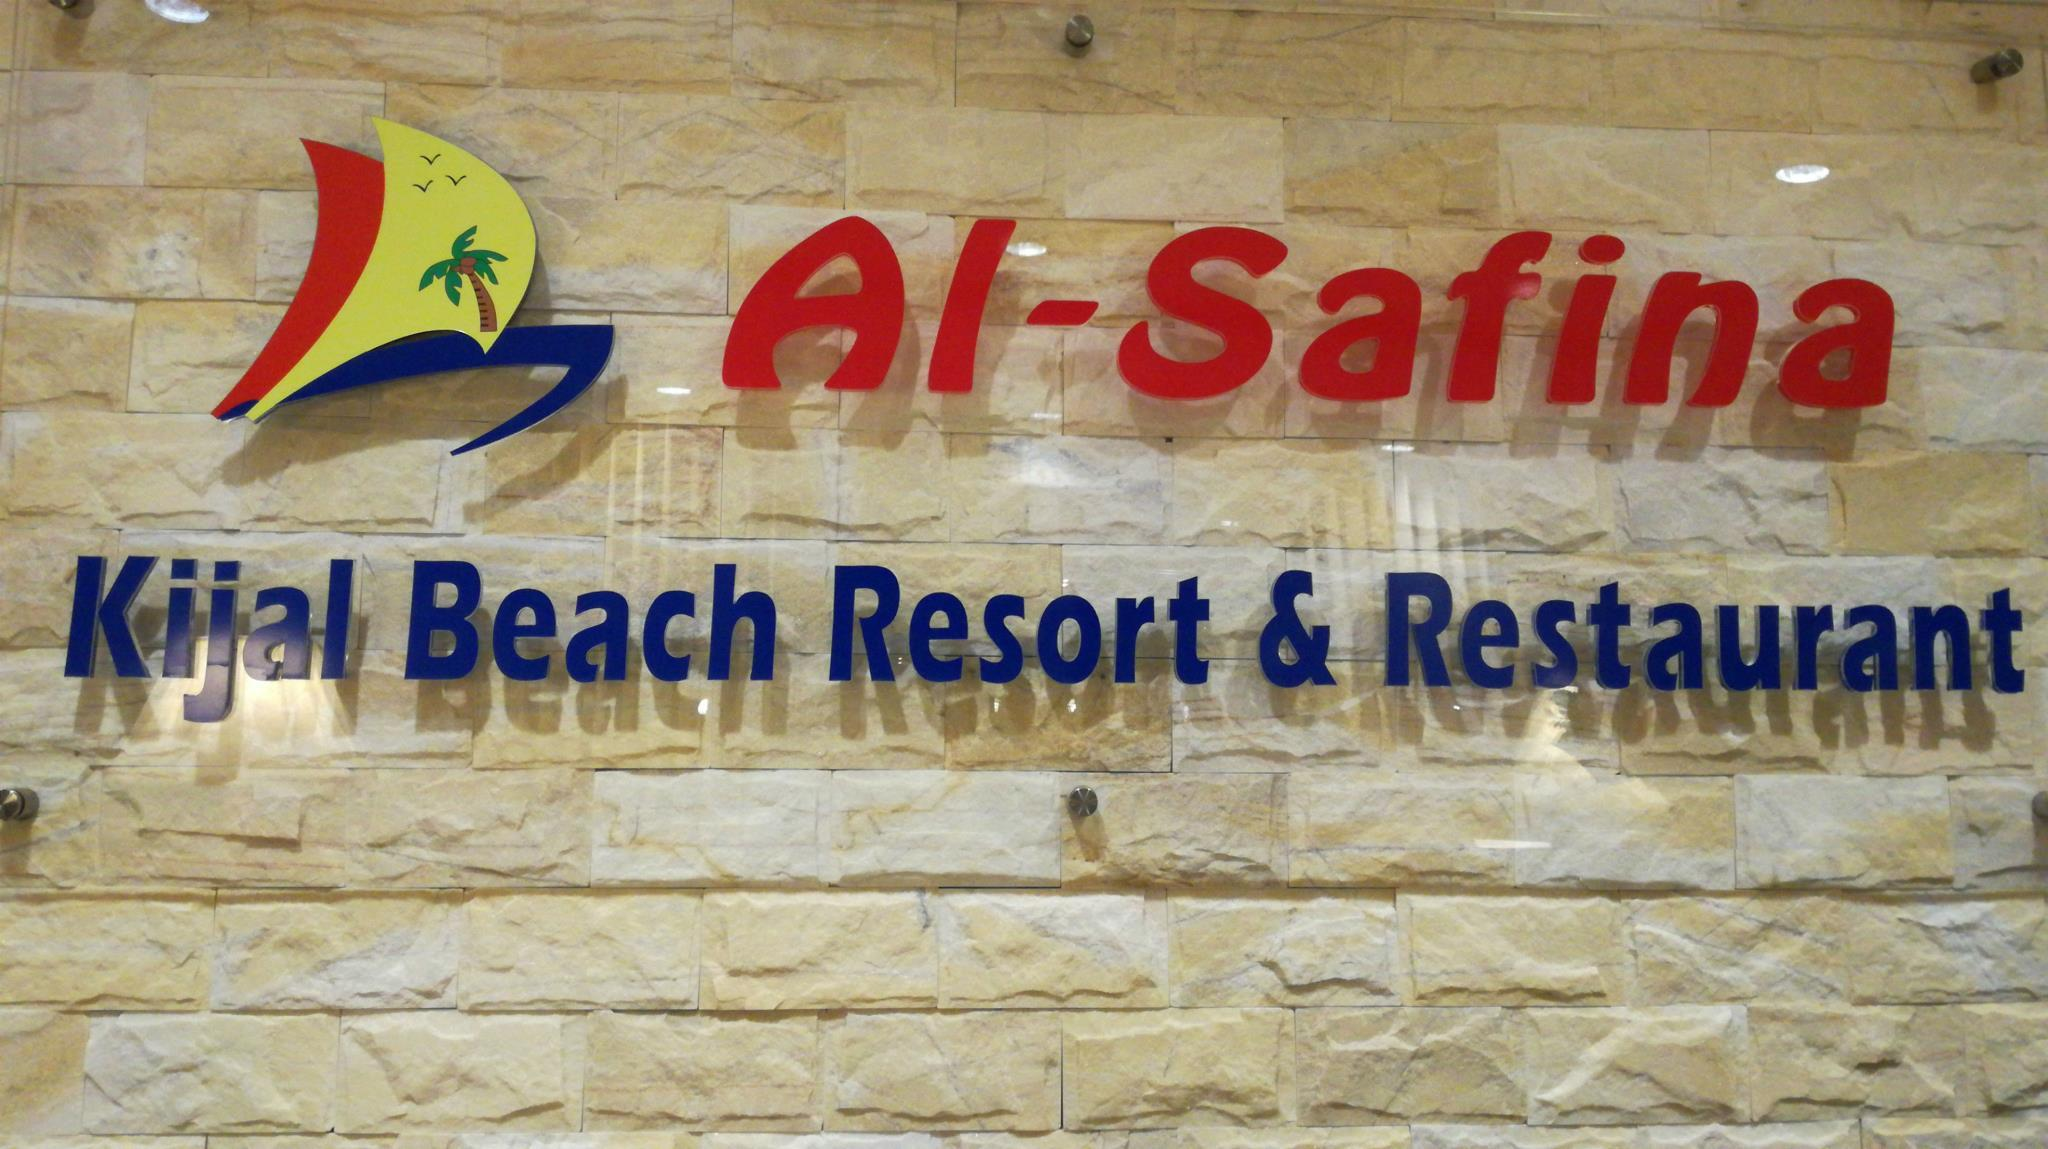 Al Safina Kijal Beach Resort & Restaurant, Kemaman